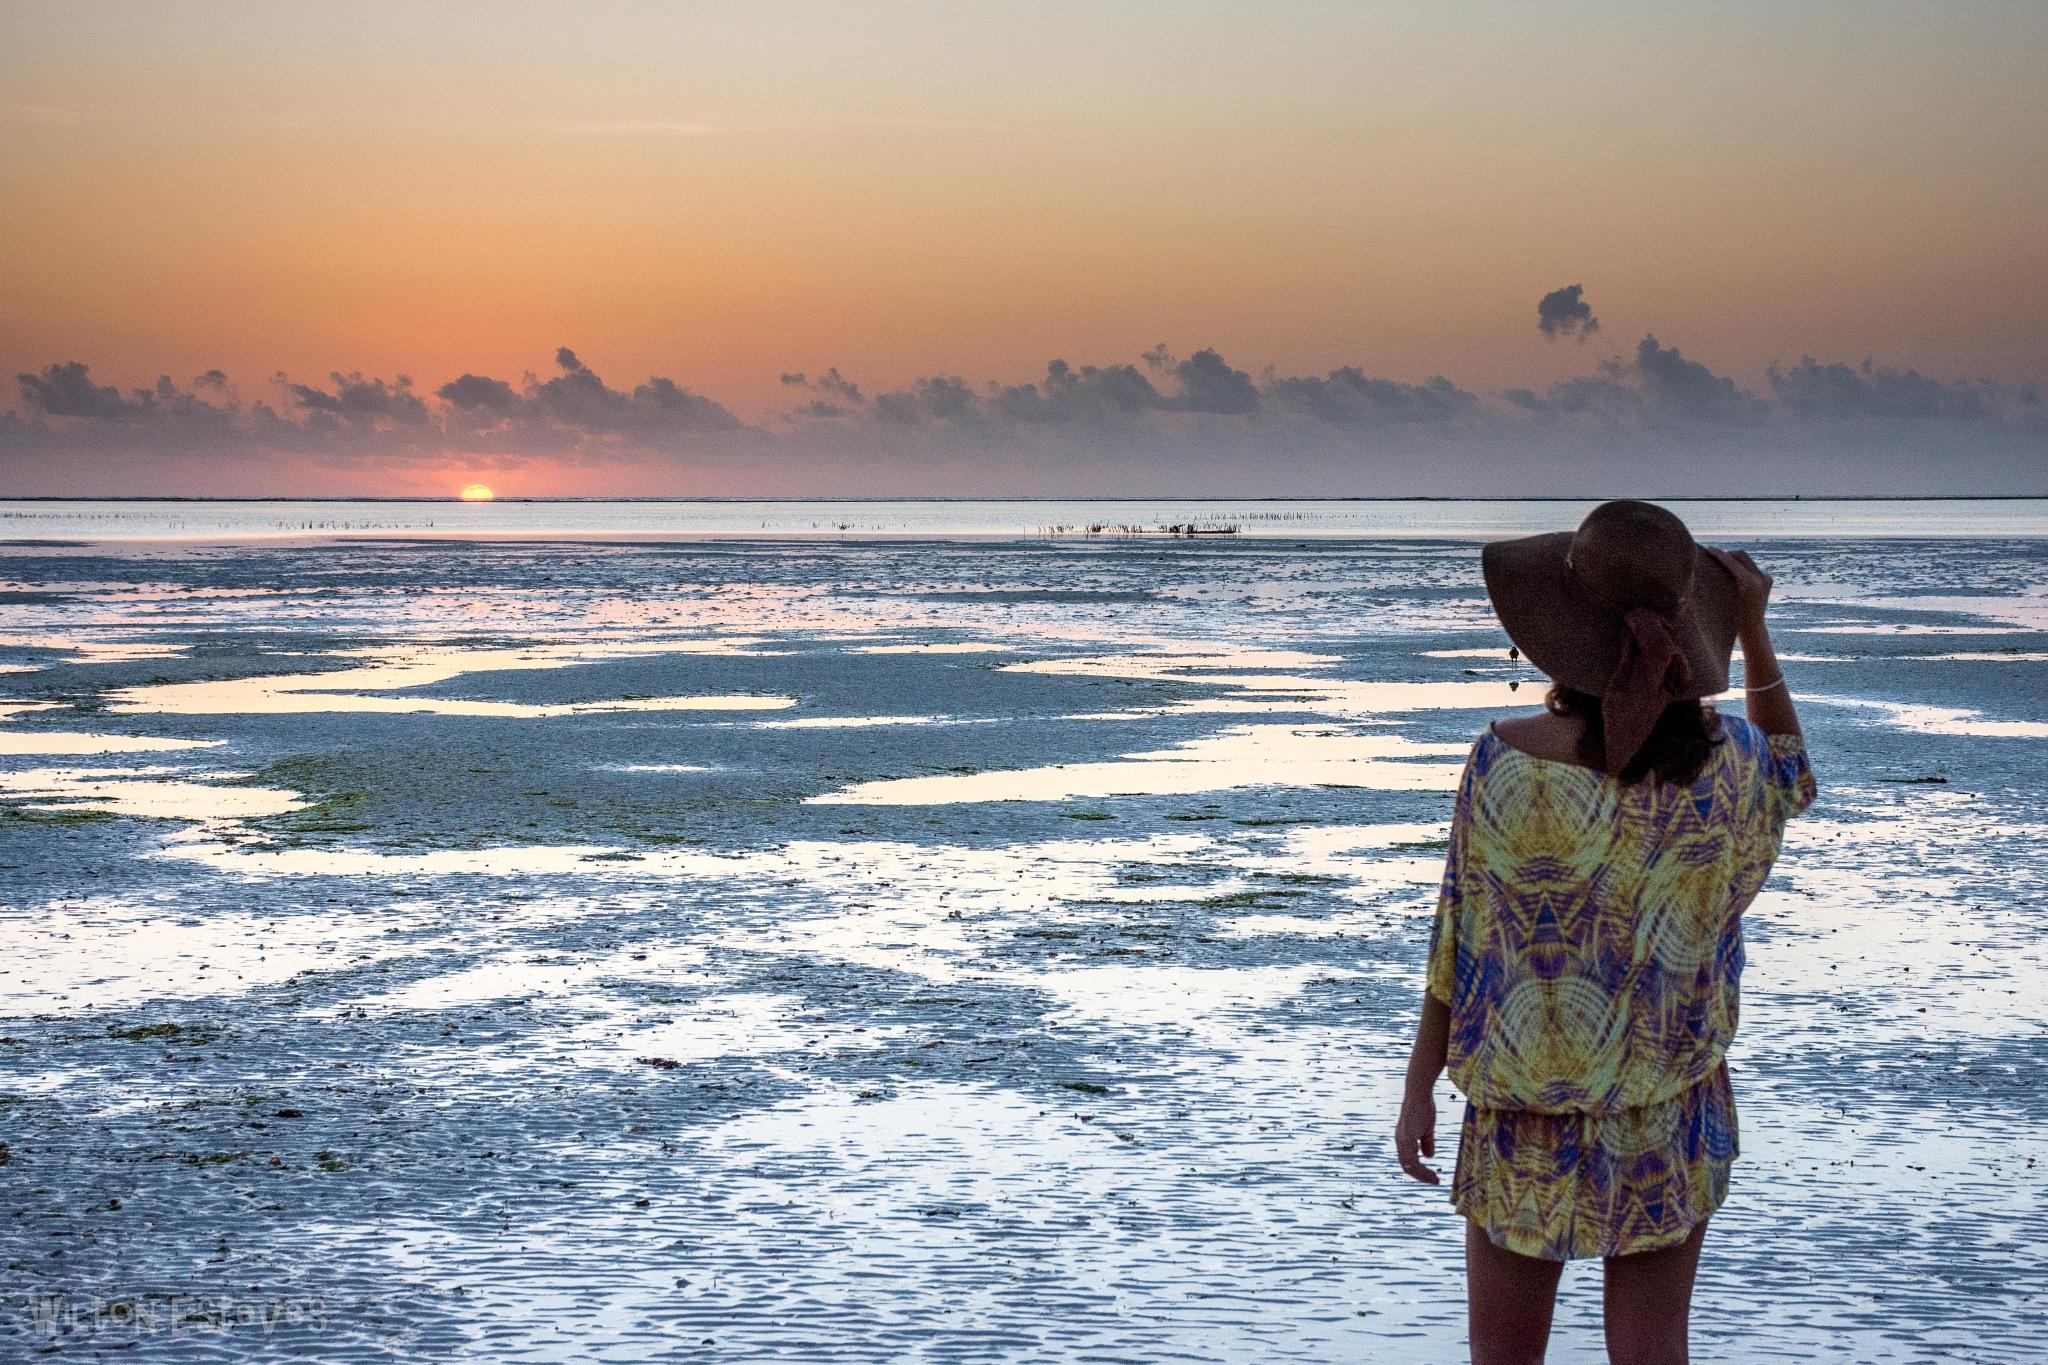 Mapenzi Beach Sun Rise by Wilton Esteves